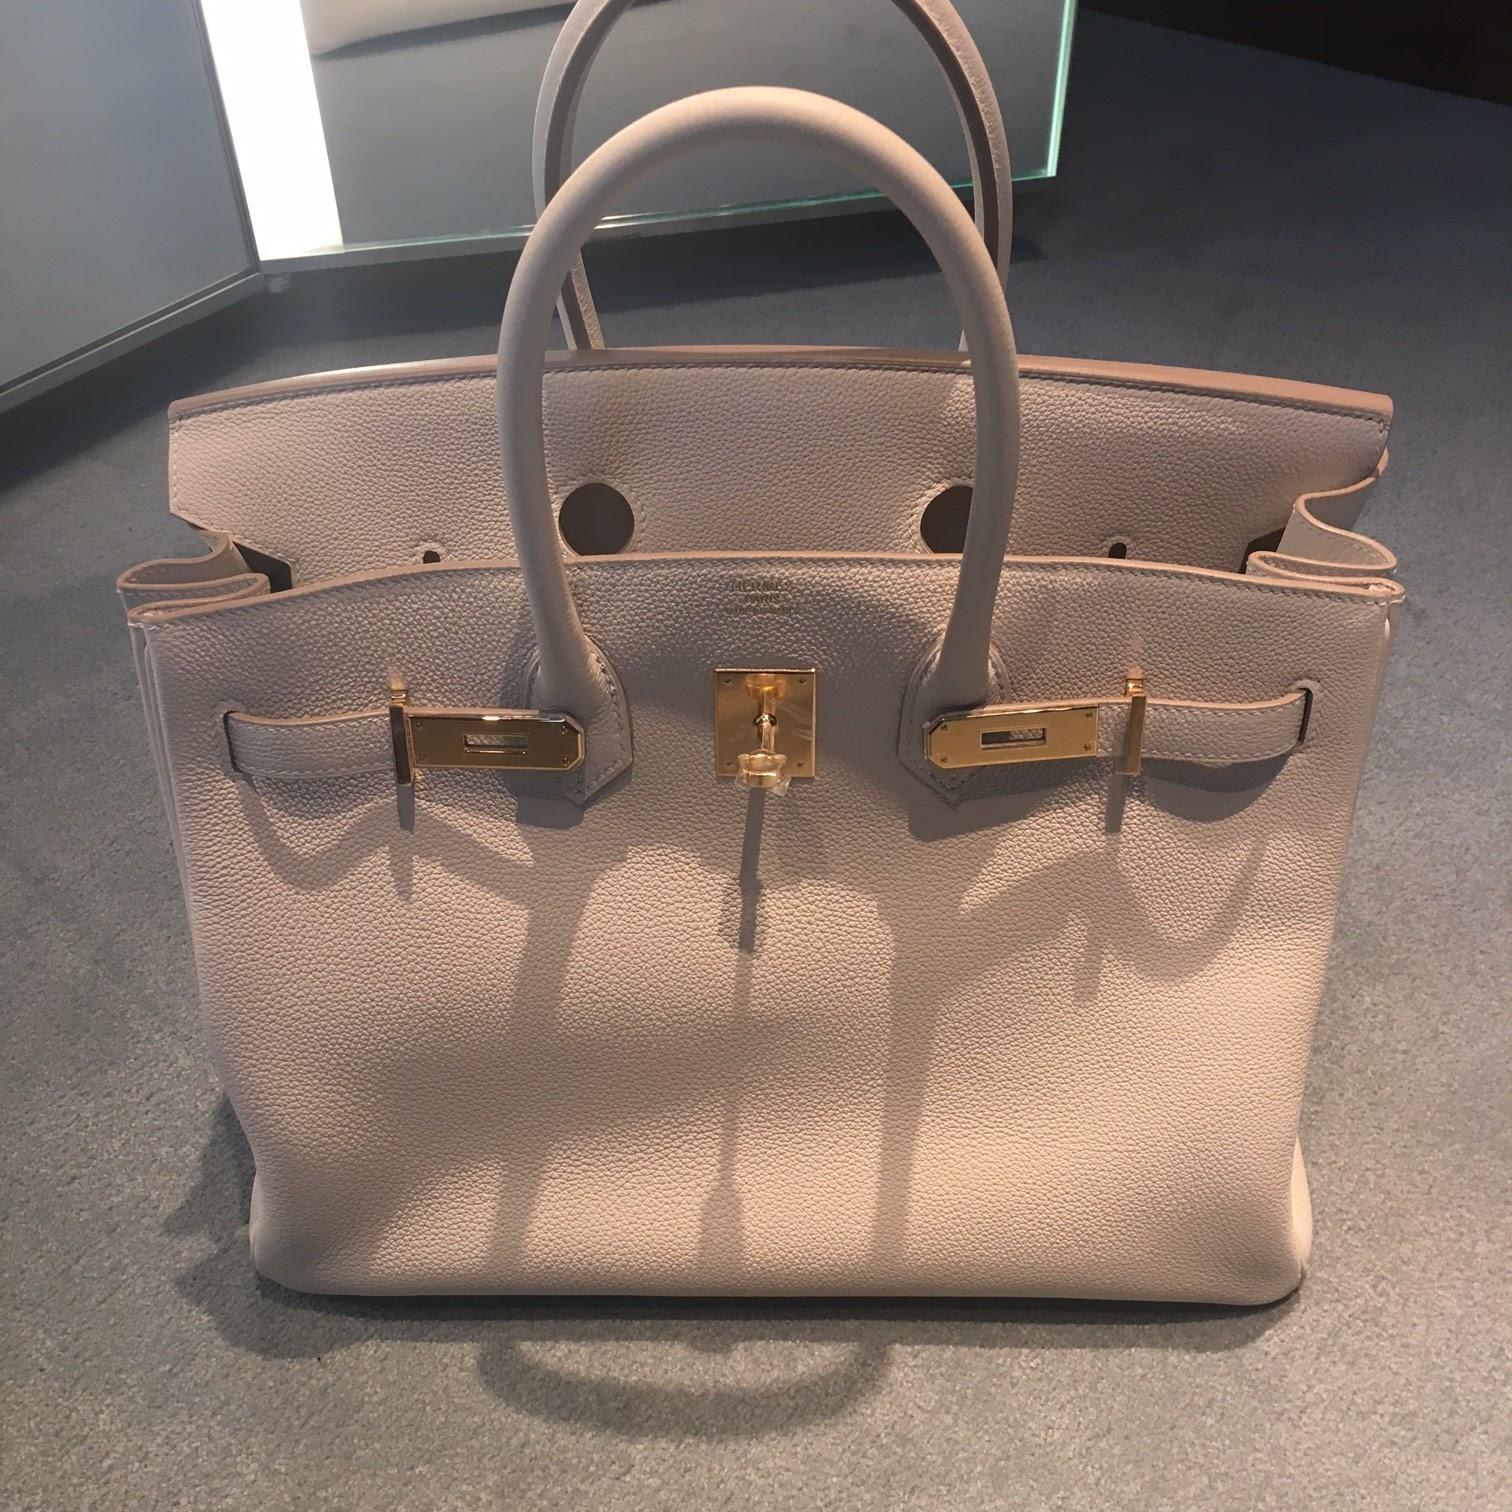 replica hermes birkin handbags - BETTER THAN SCRUBS: The Bag: THE Bag - The Birkin